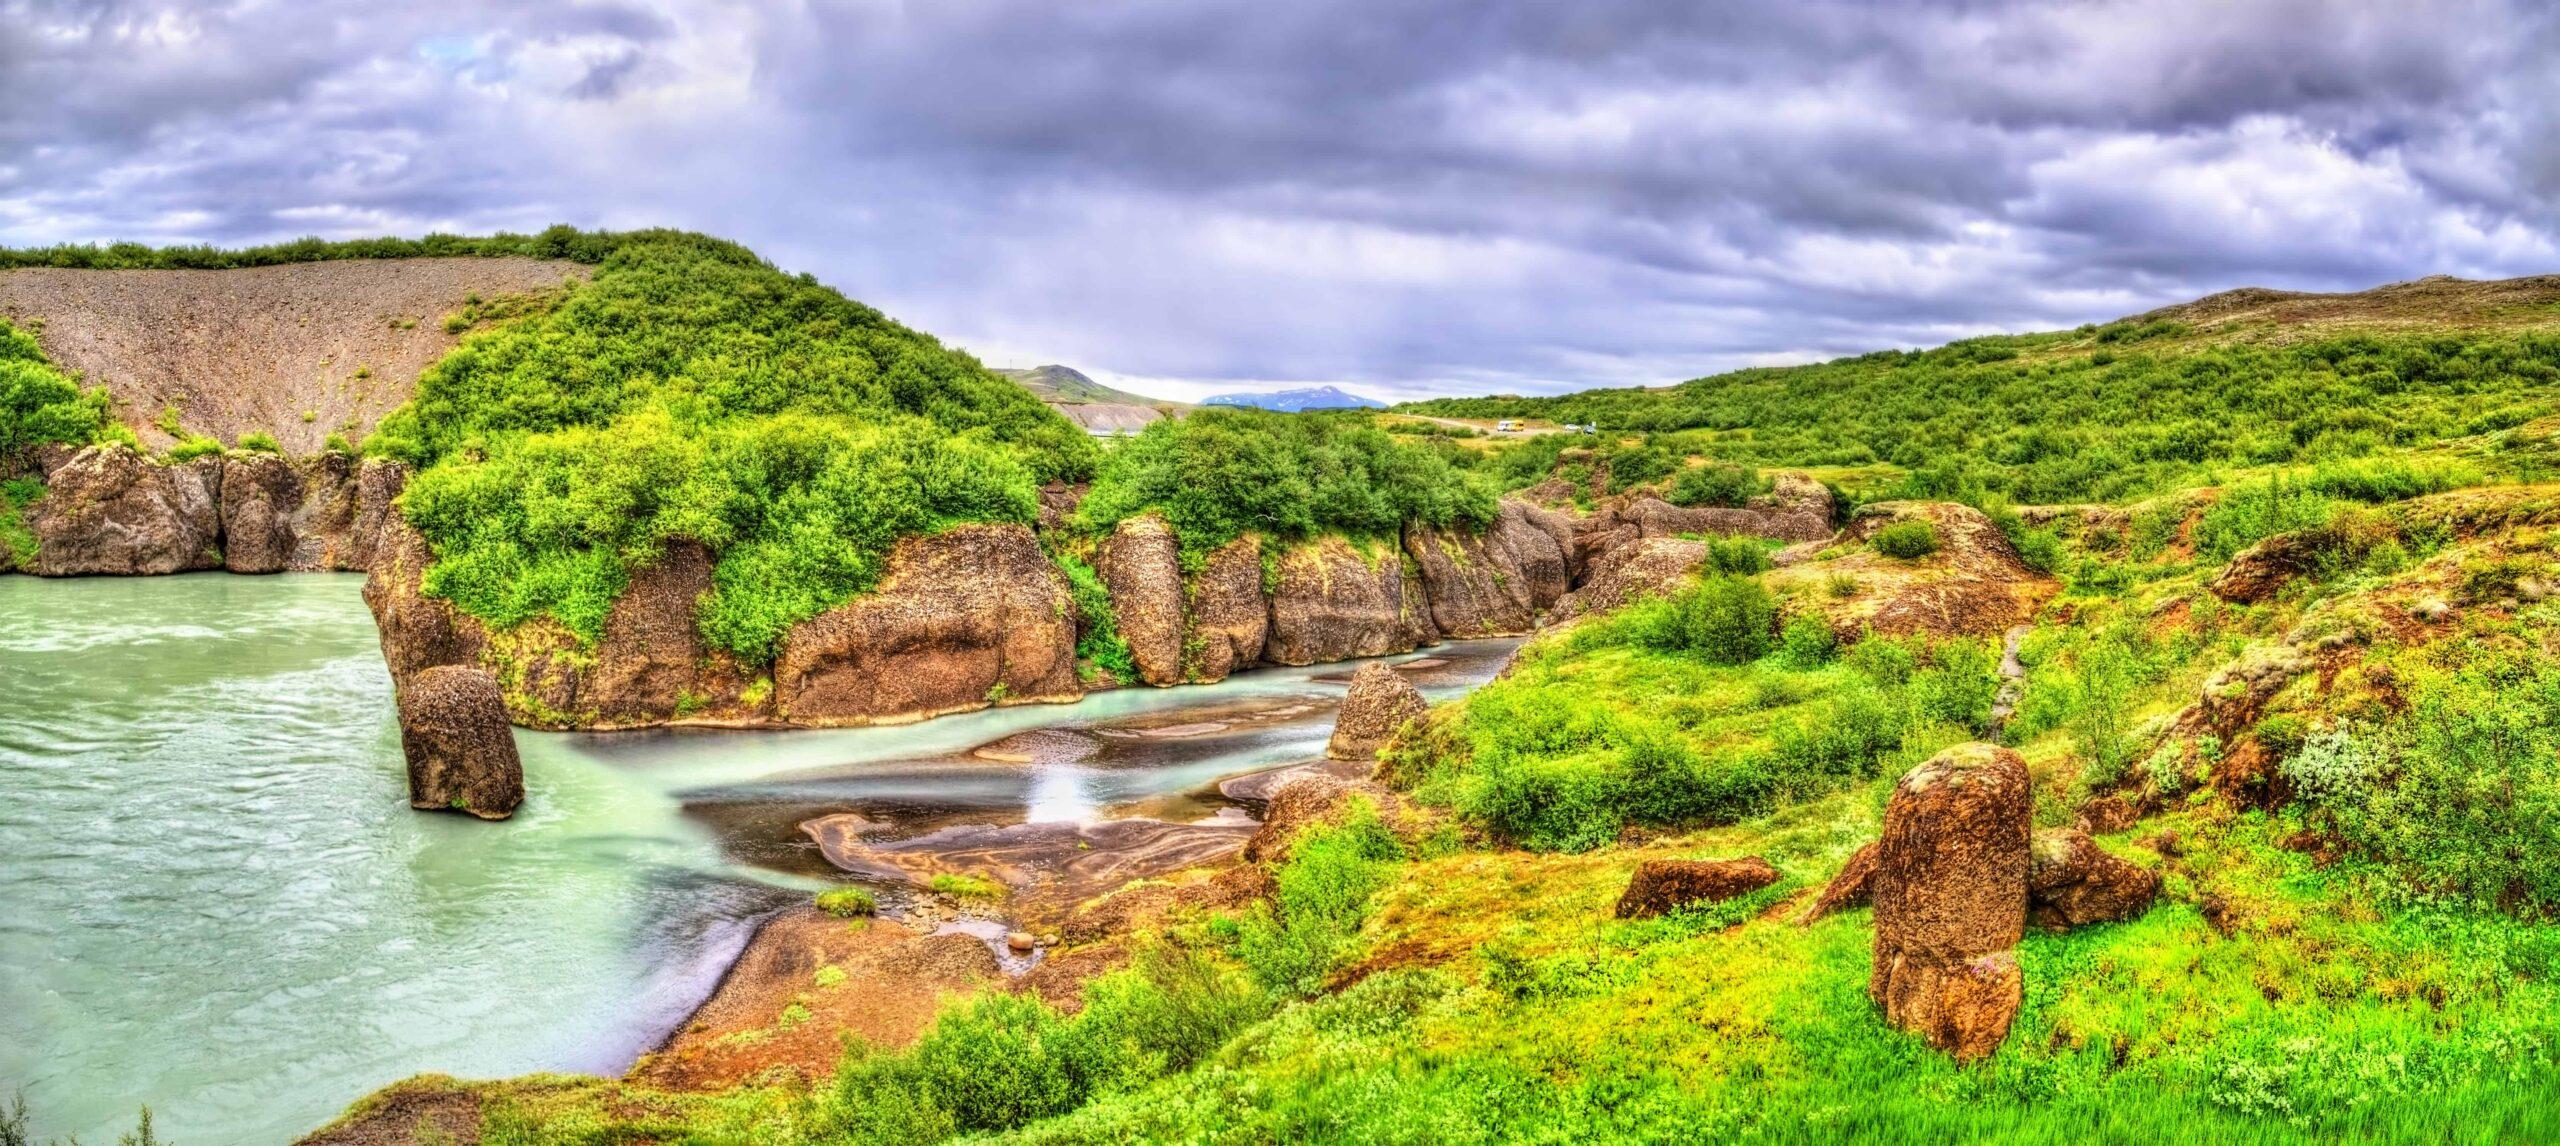 Brúarhlöð canyon in the Golden Circle